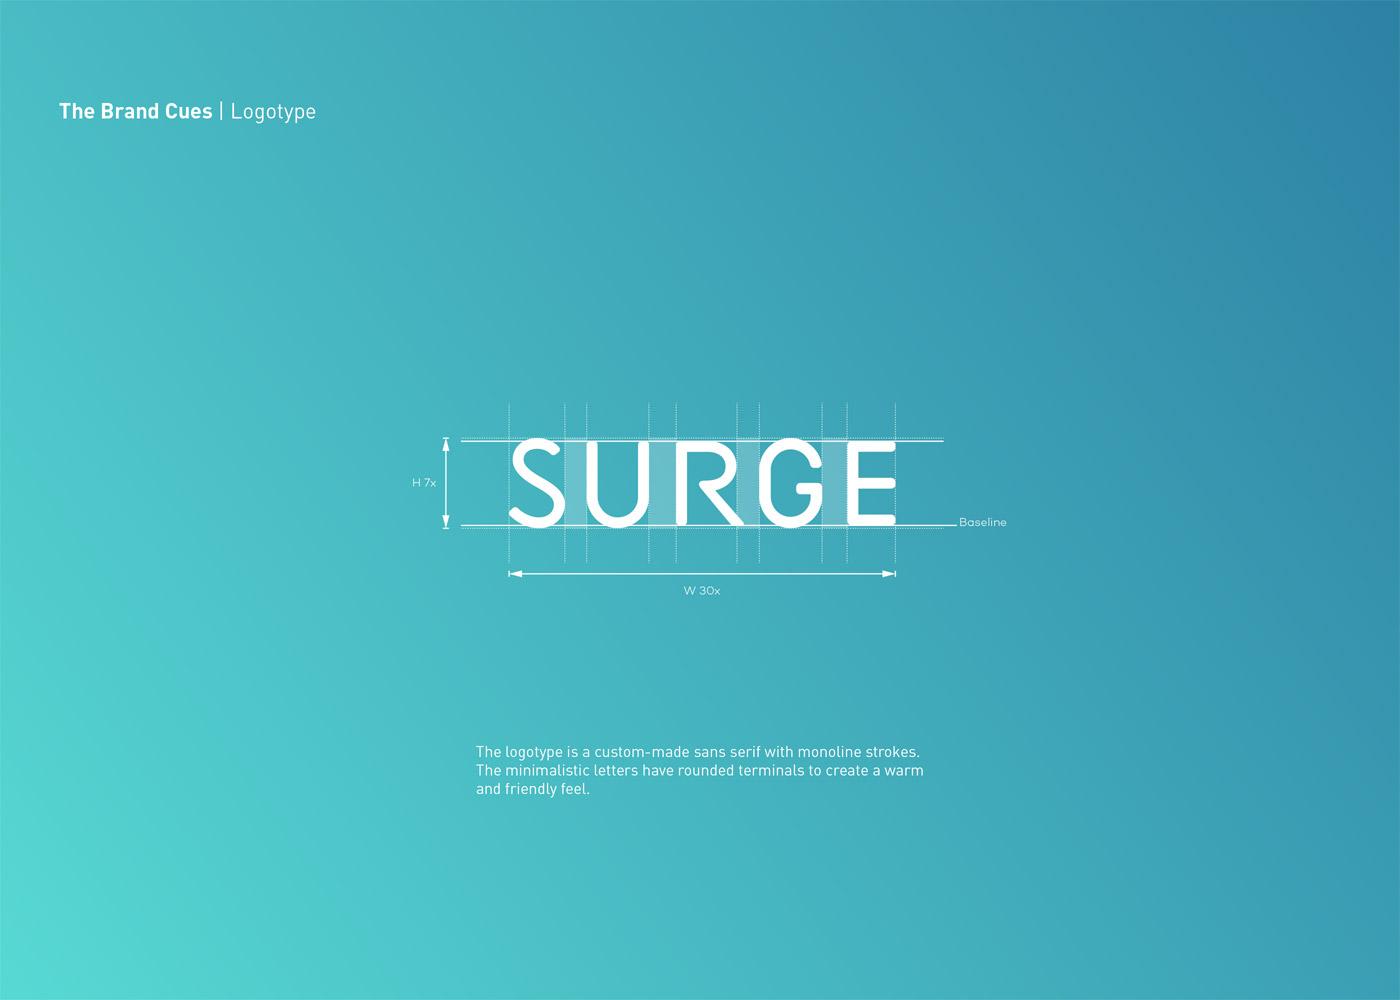 SURGE logo design and branding by Maria Grønlund